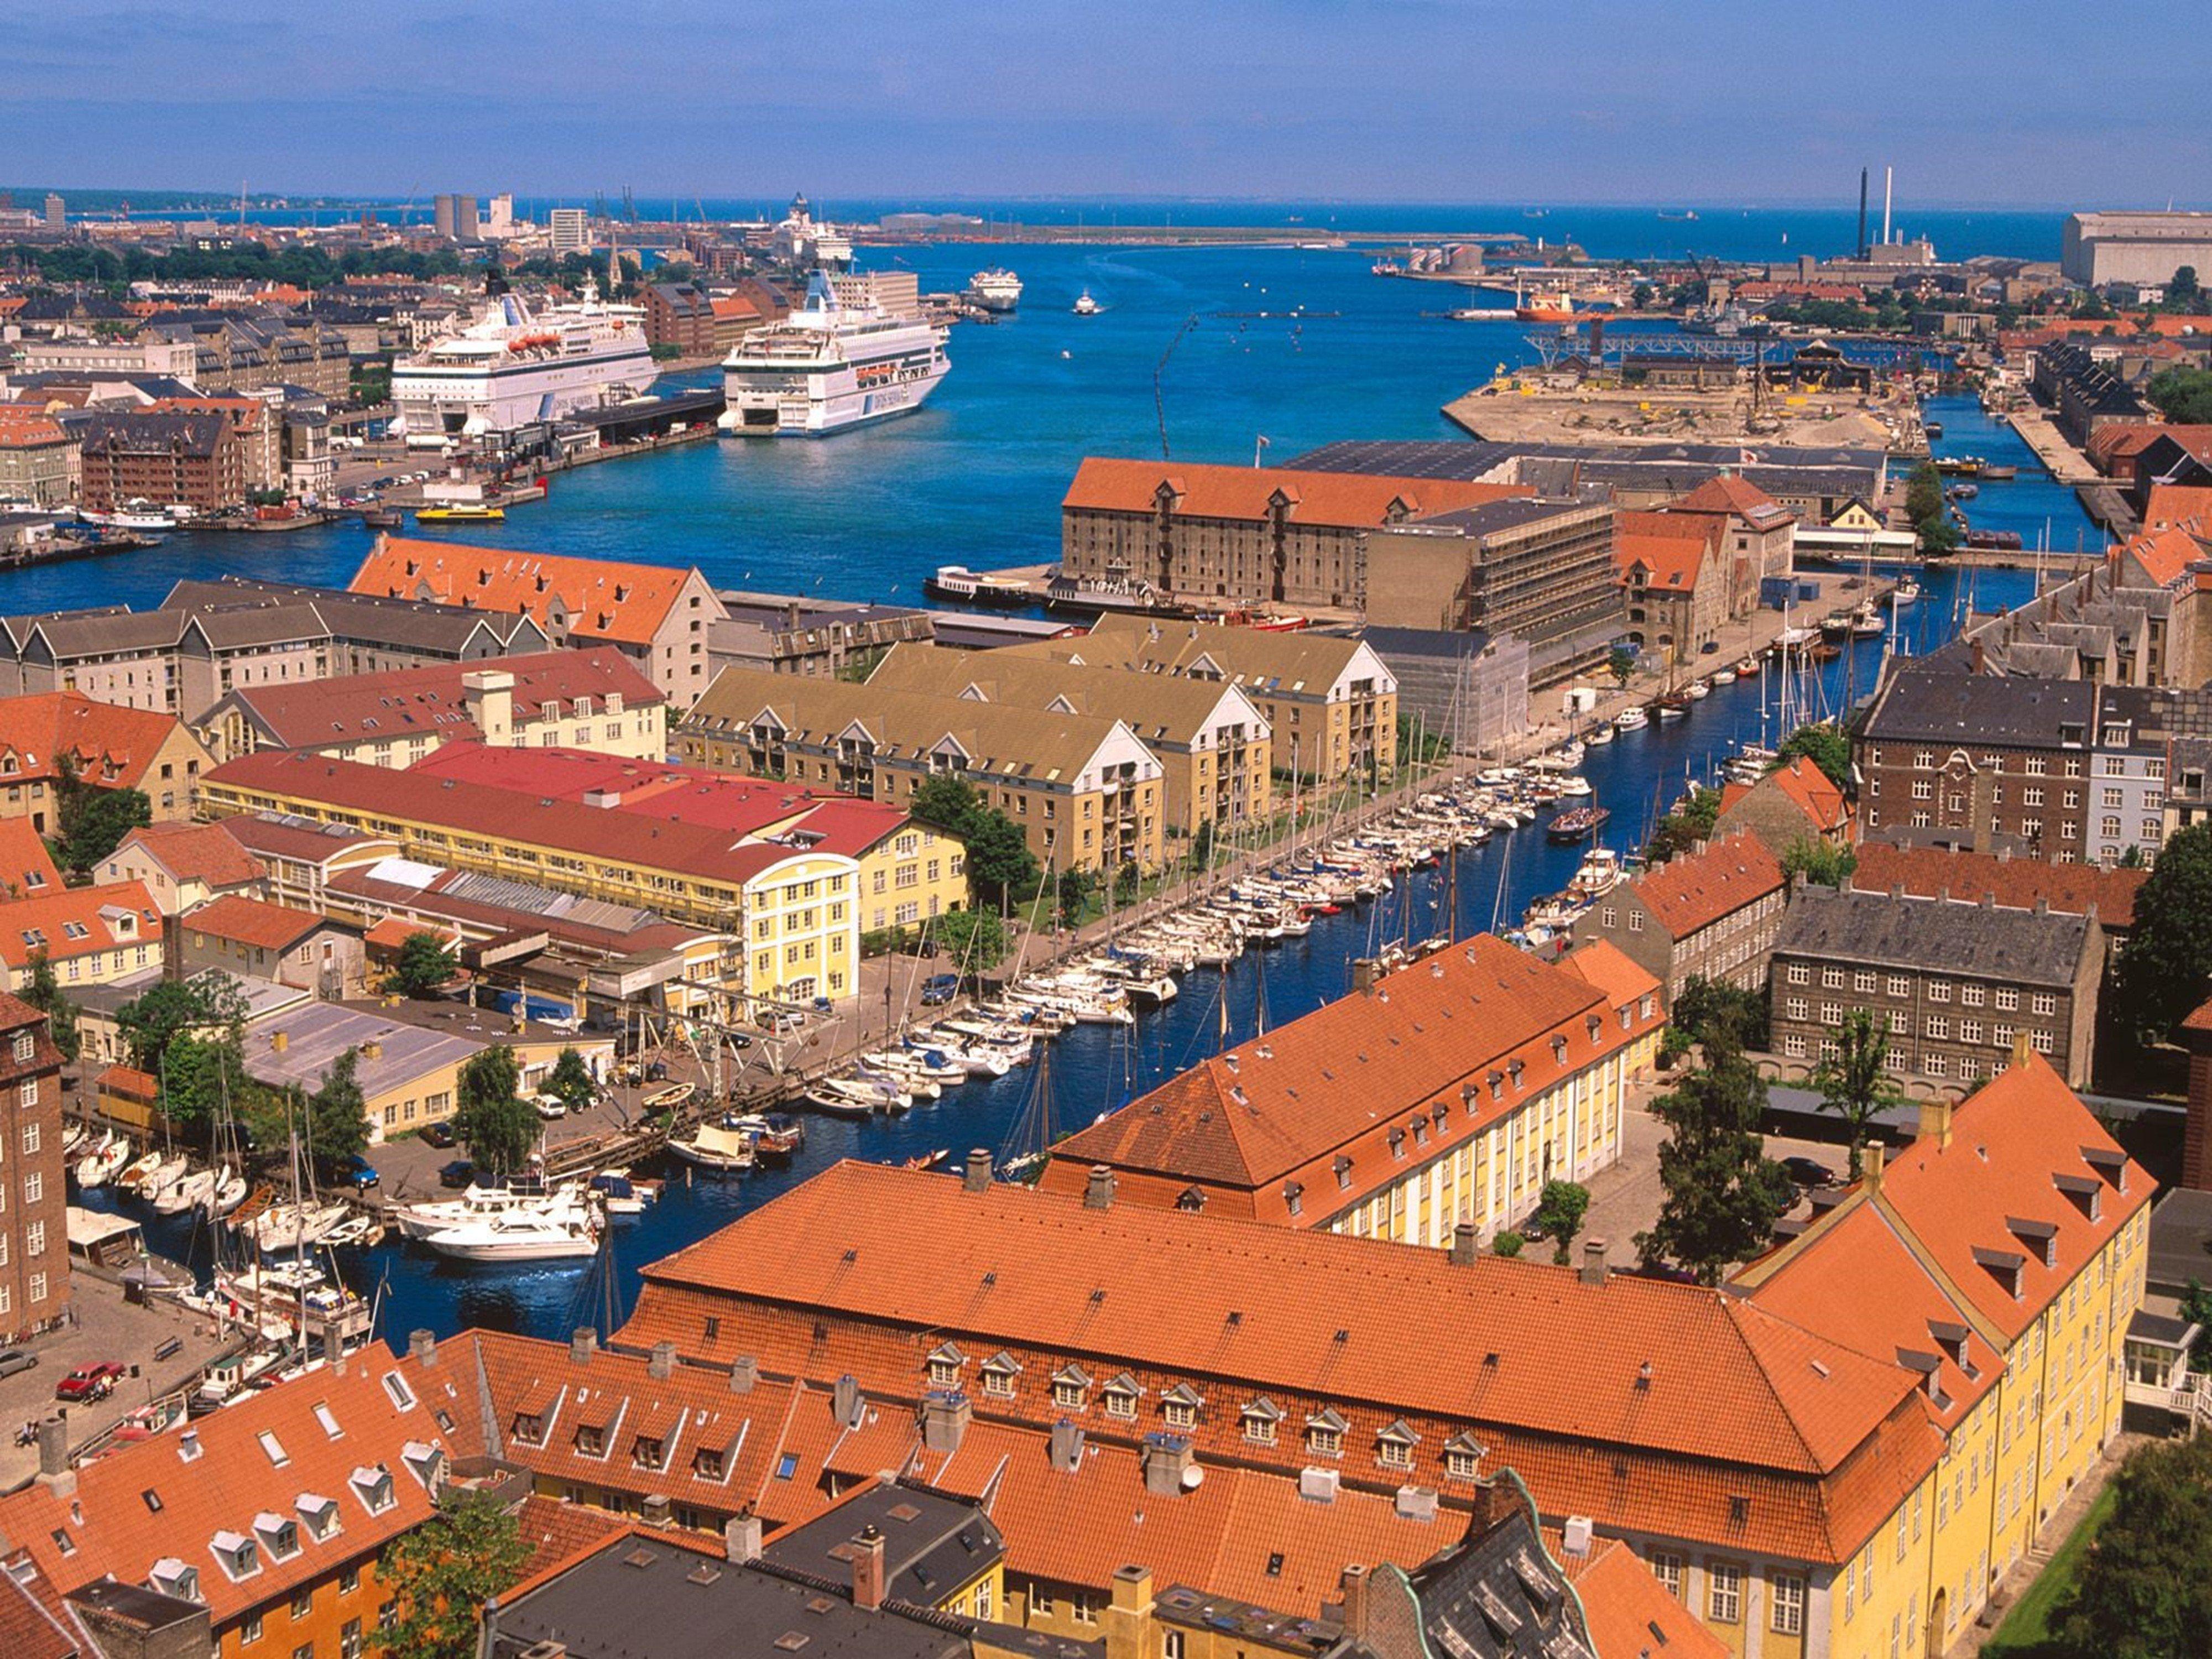 Copenhagen harbor denmark city europe 4000x3000 wallpaper 4000x3000 340297 wallpaperup - Copenhagen wallpaper ...